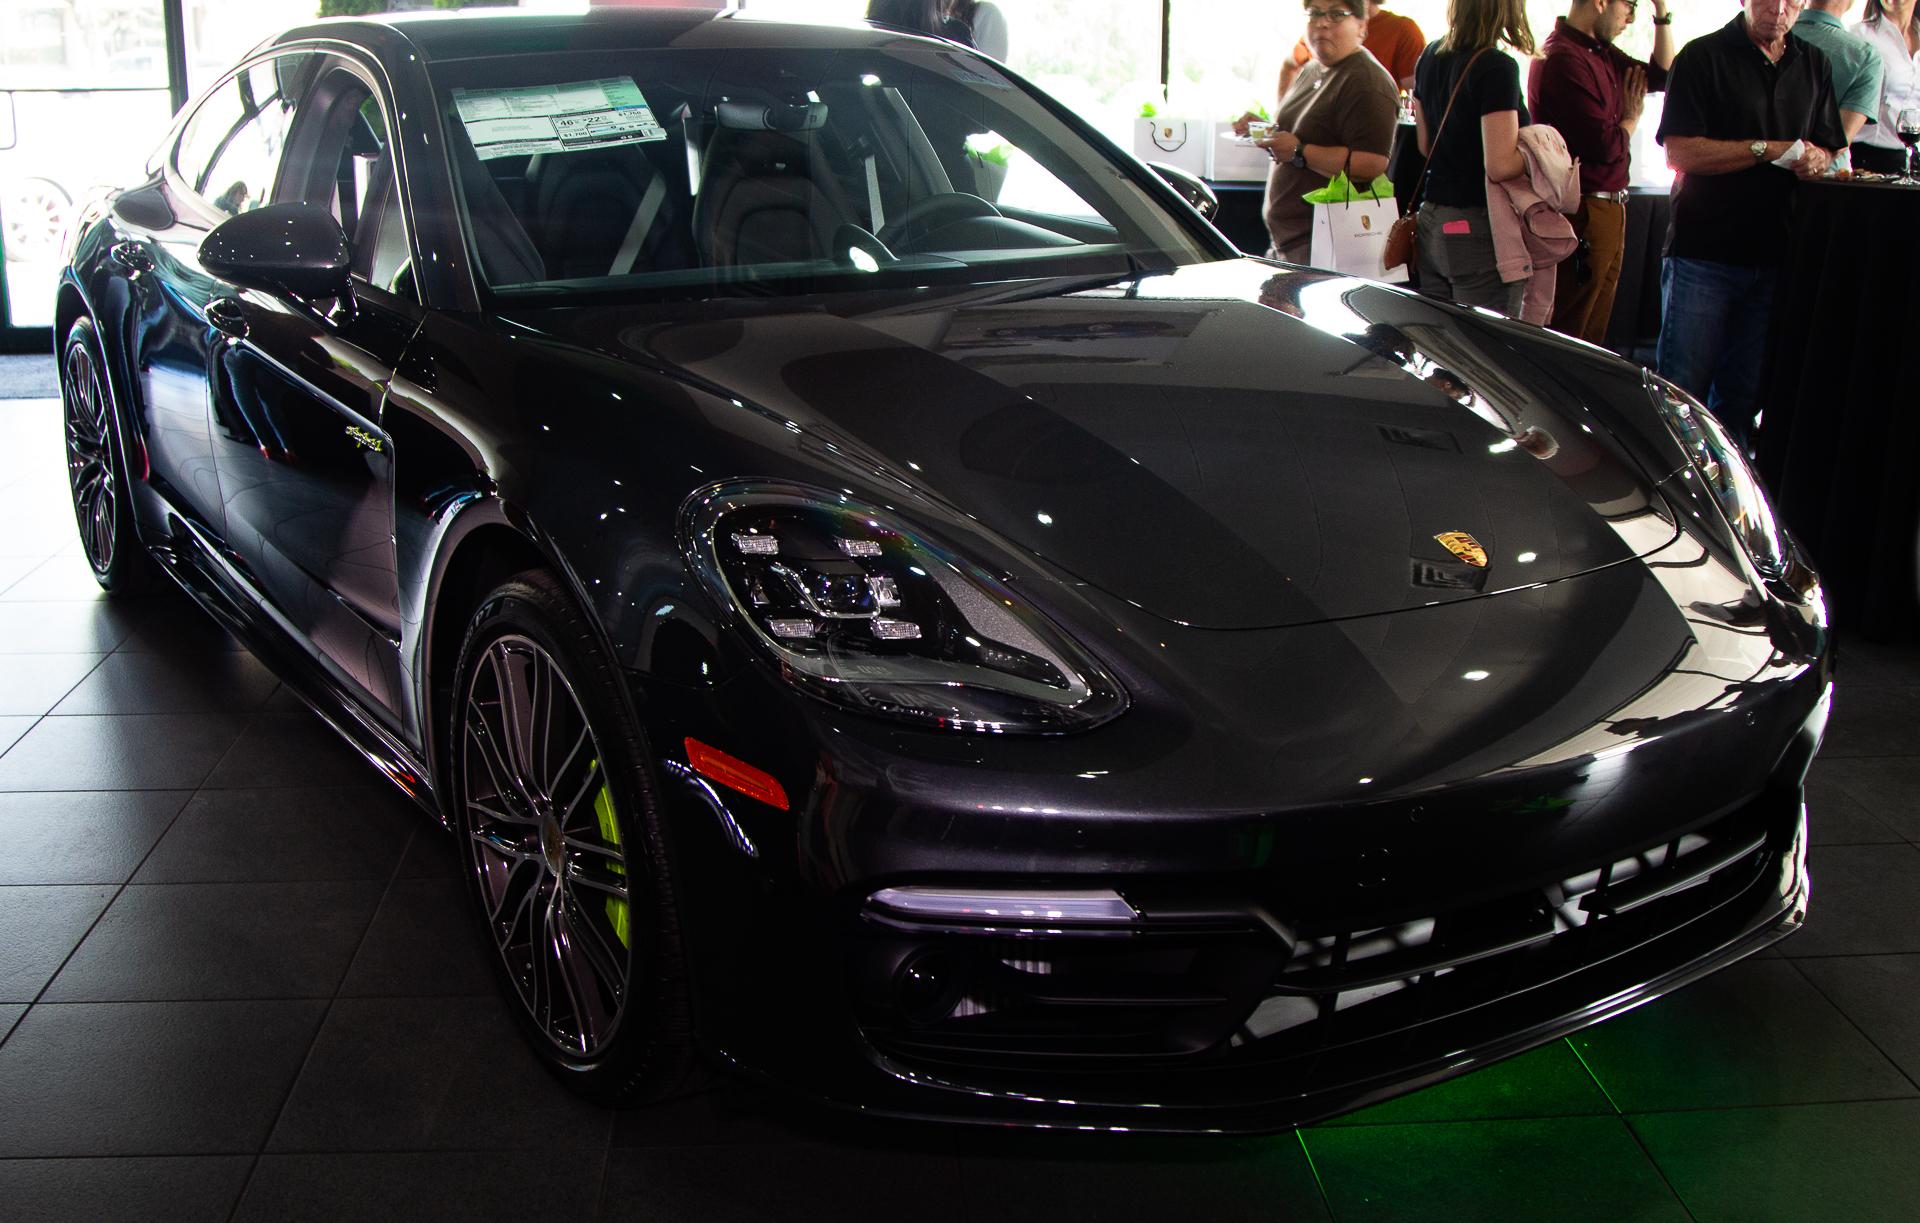 Porsche-Austin-2018-Panamera-10.jpg